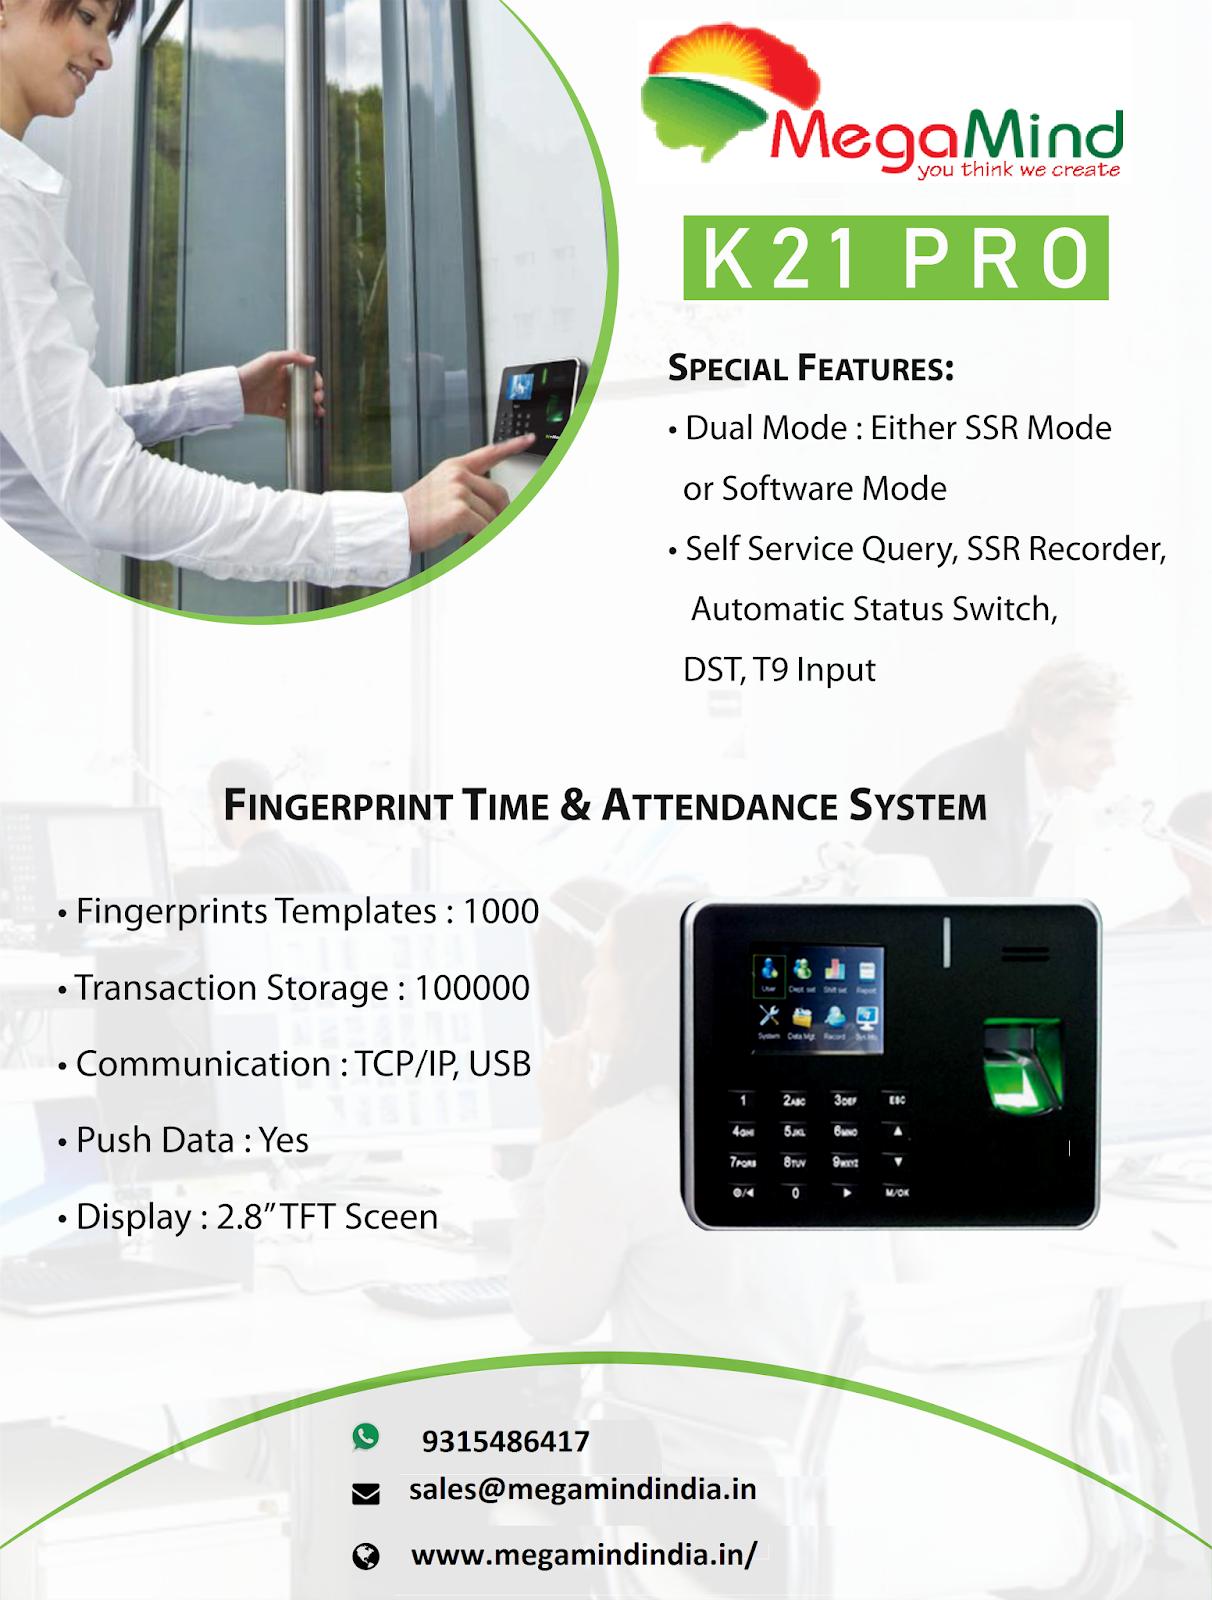 MegaMind Technosoft: Biometric Attendance System and